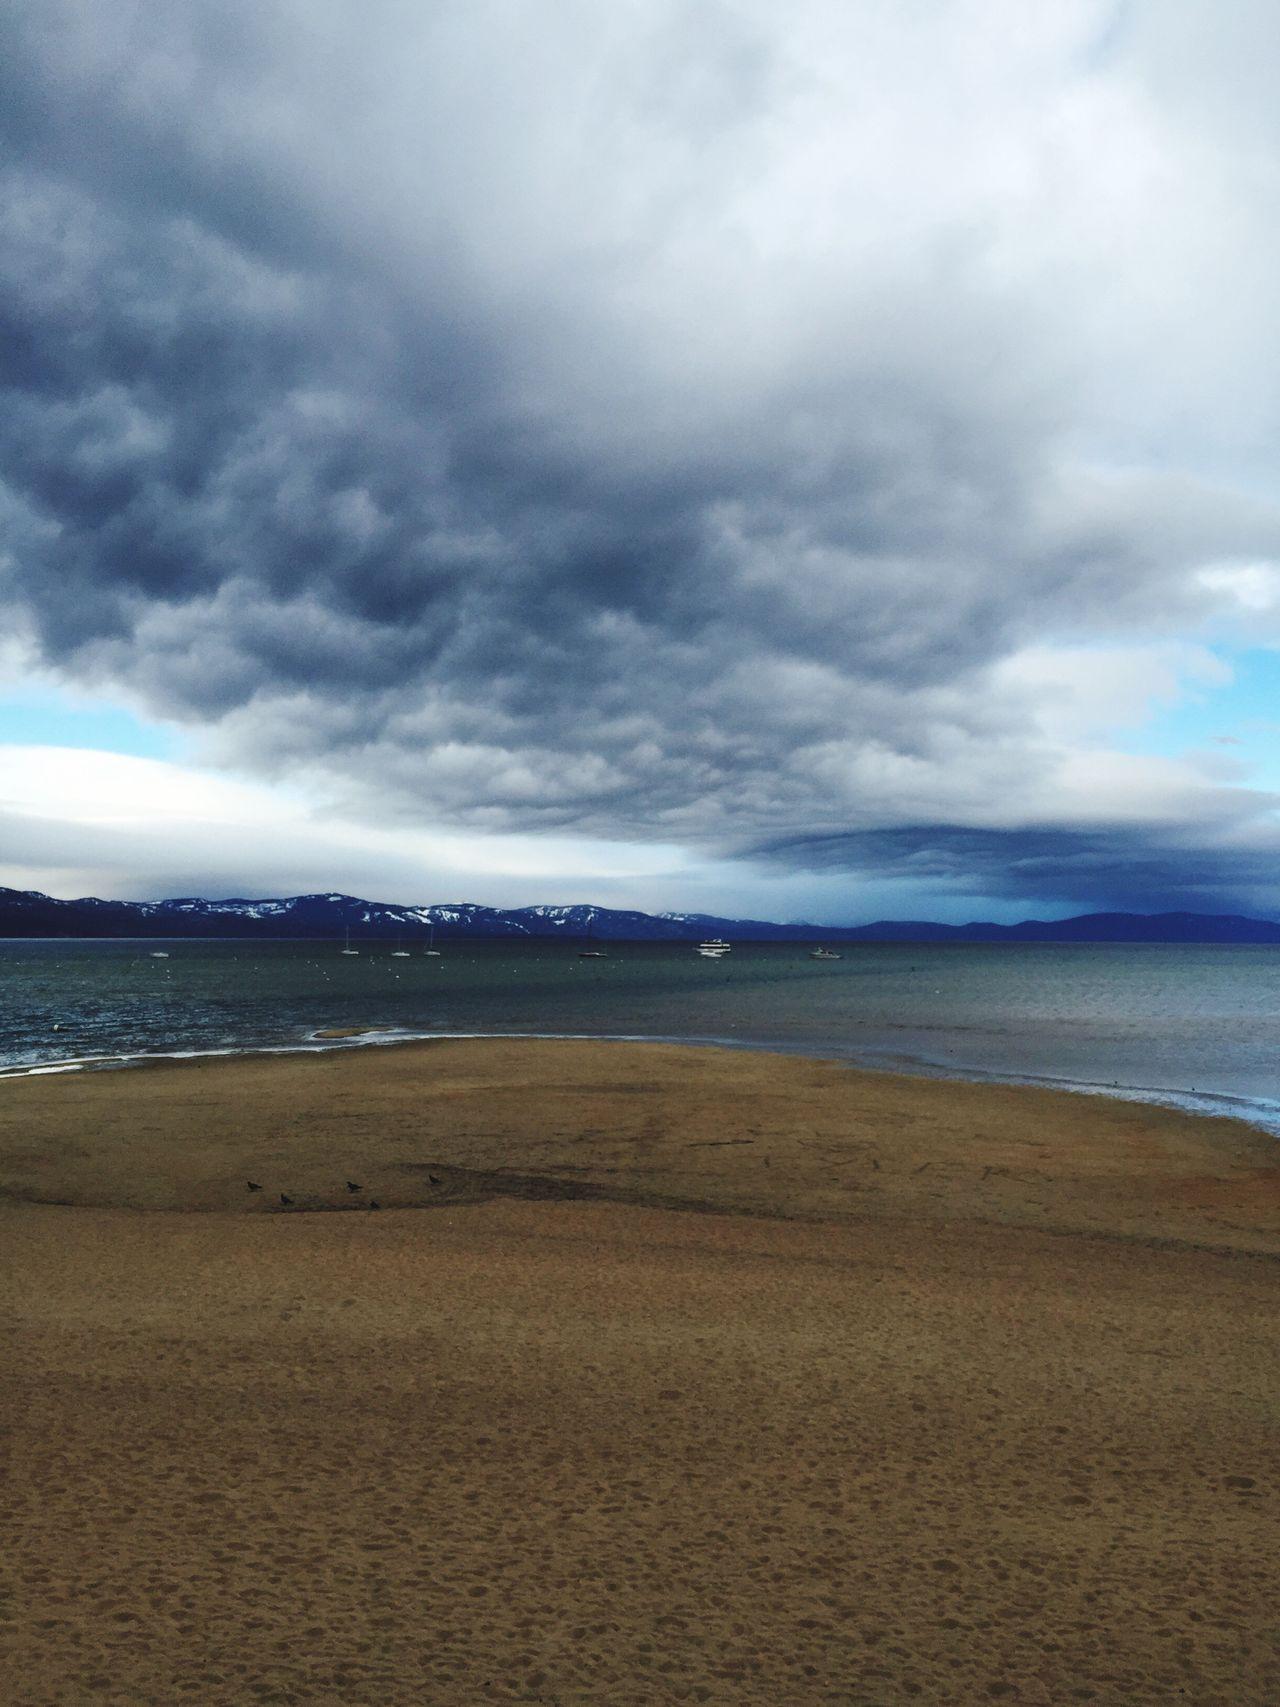 Lake Tahoe, Ca Beach Wintertime Tahoe Beach Beach Mountains Cloudy Day Storm Cloud